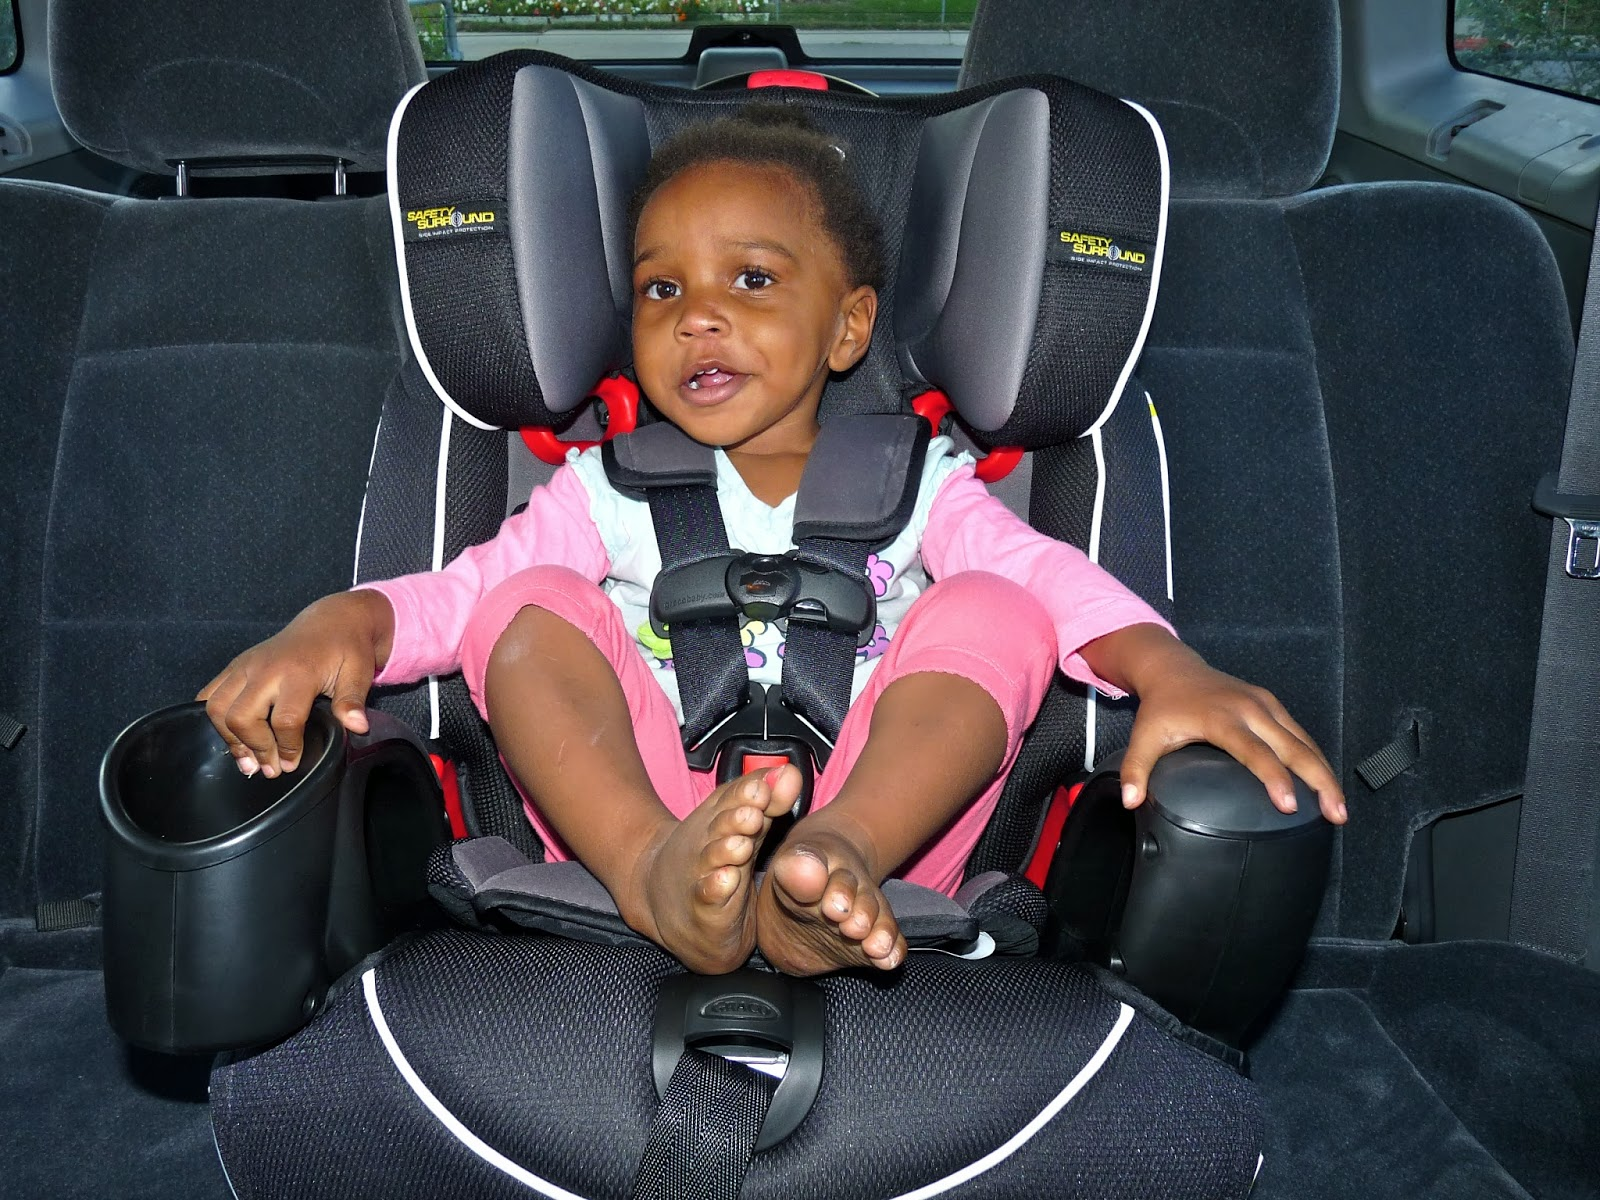 Graco nautilus 3 in 1 multi use car seat -  Multi Use Car Seat Bravo Graco Nautilus 65 3 In 1 Harness Booster Polar Babies R Us